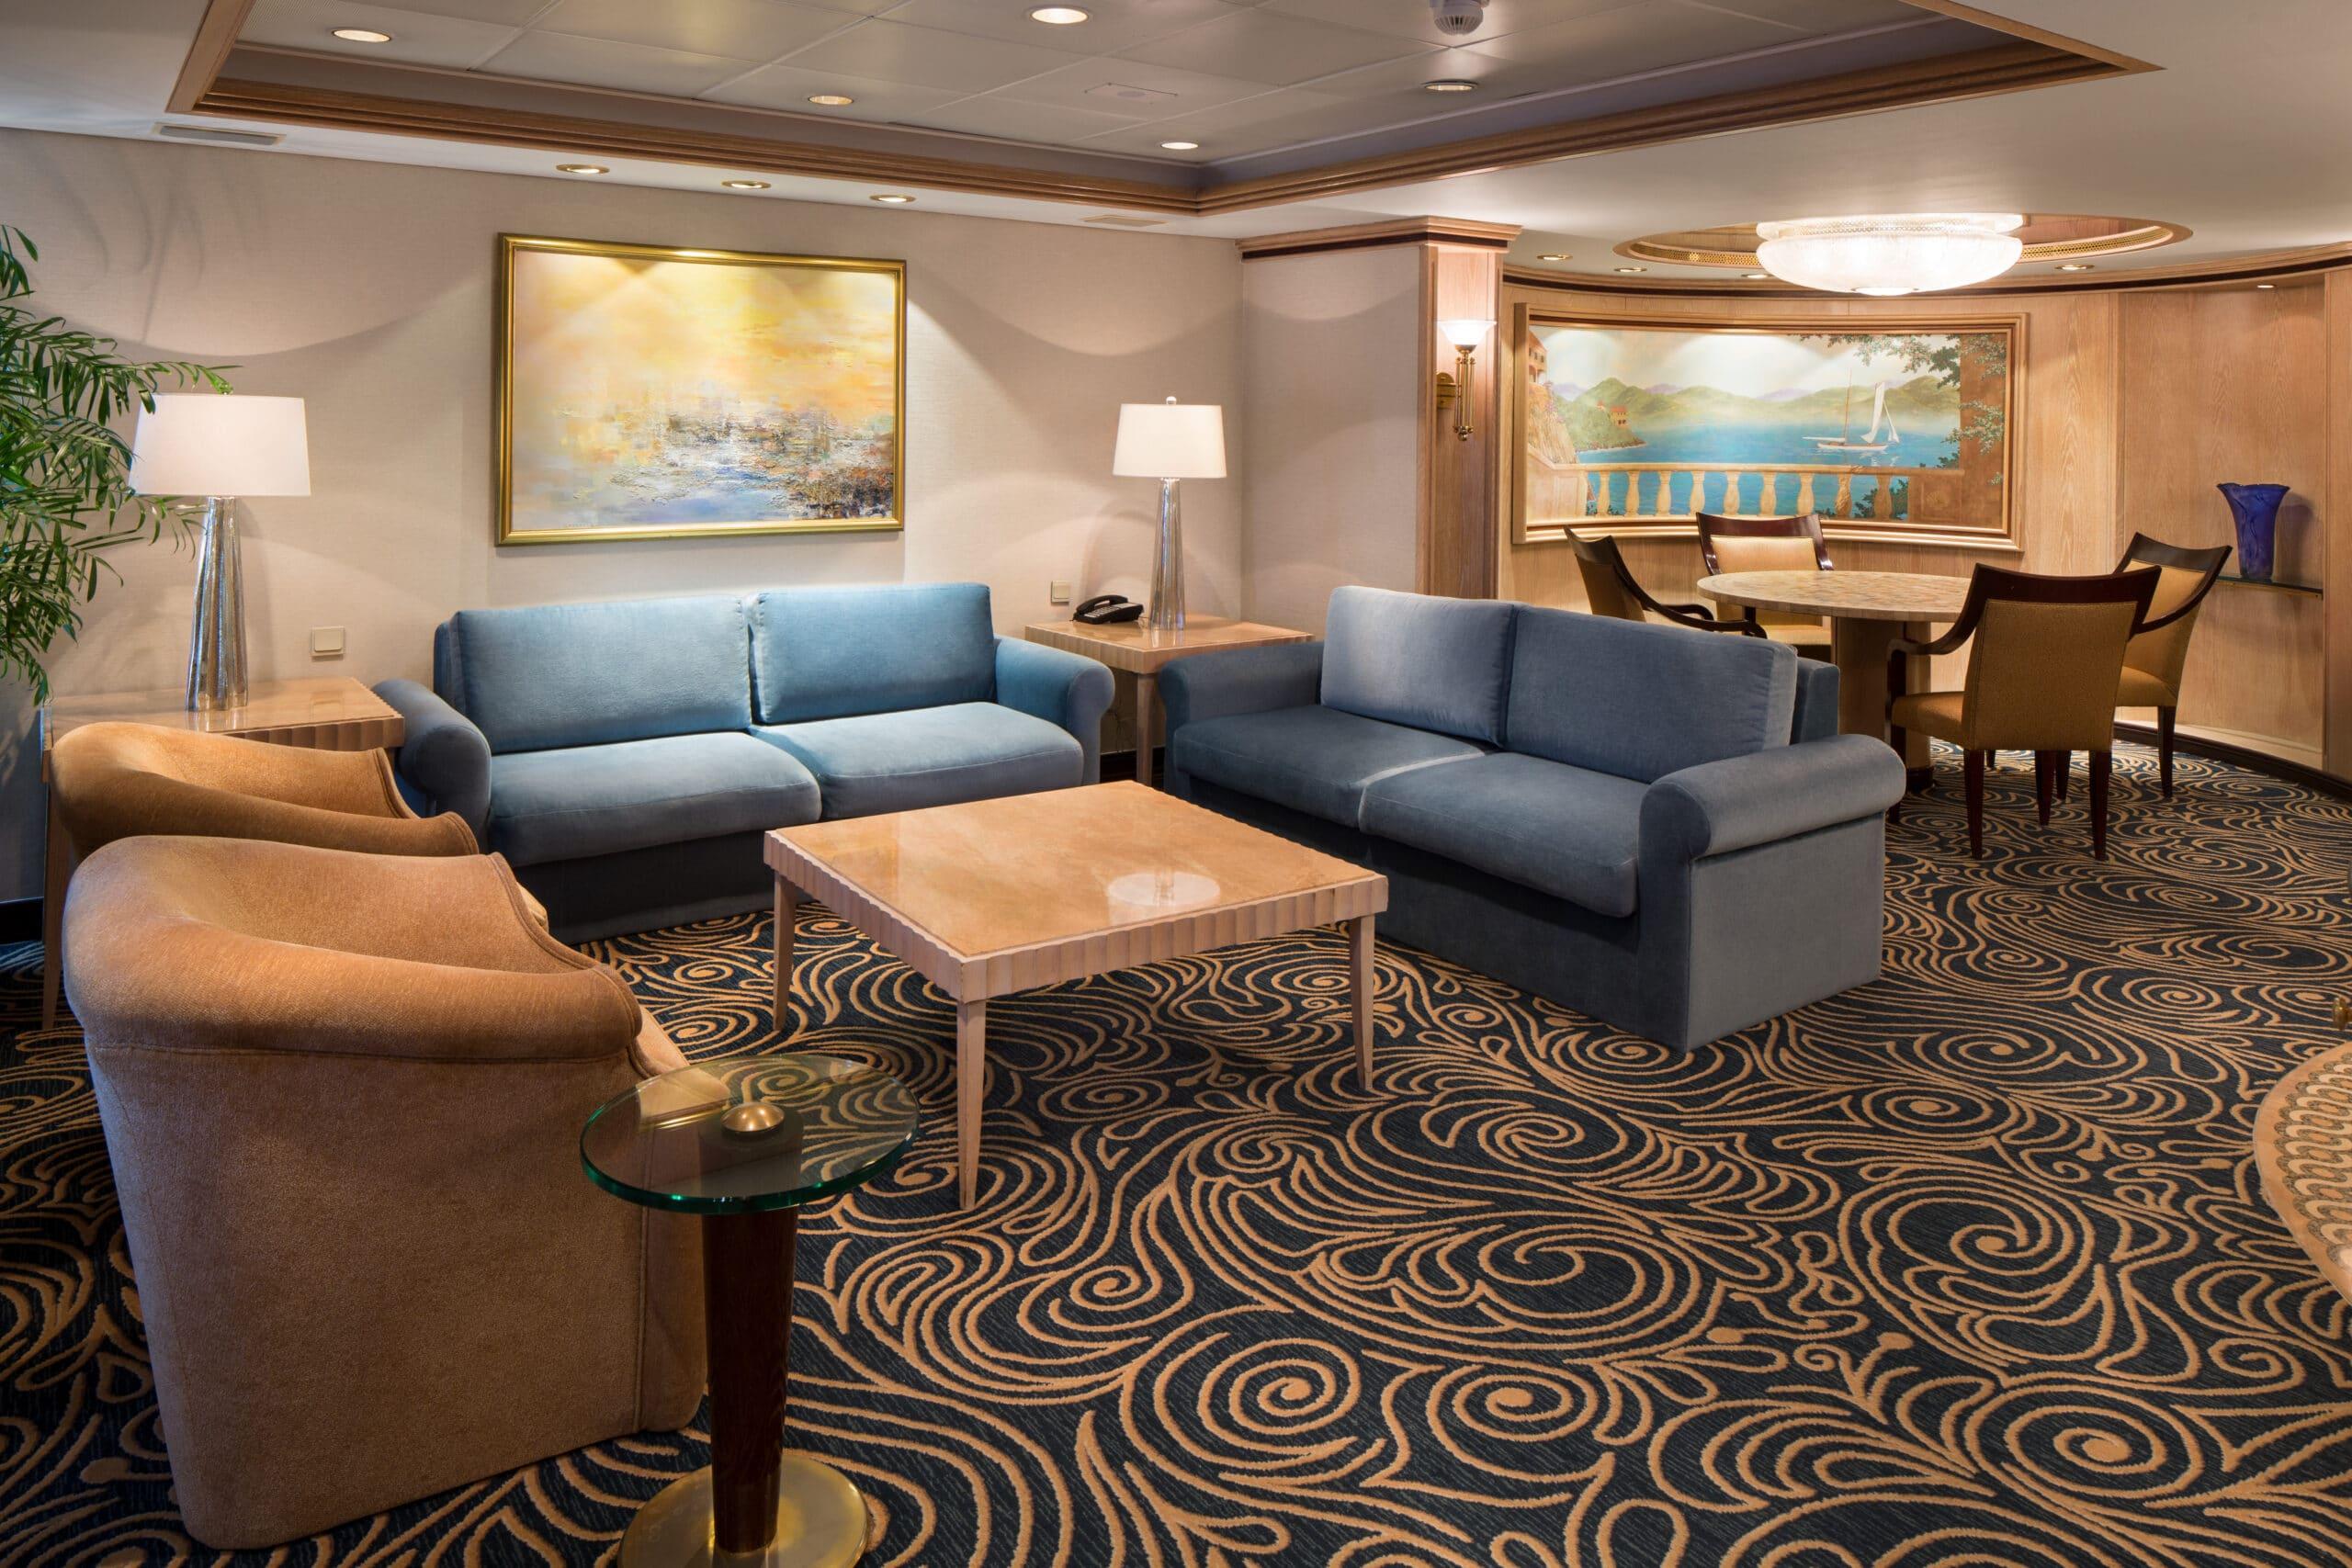 Royal-Caribbean-International-Rhapsody-of-the-Seas-schip-cruiseschip-categorie-RS-Royal-Suite